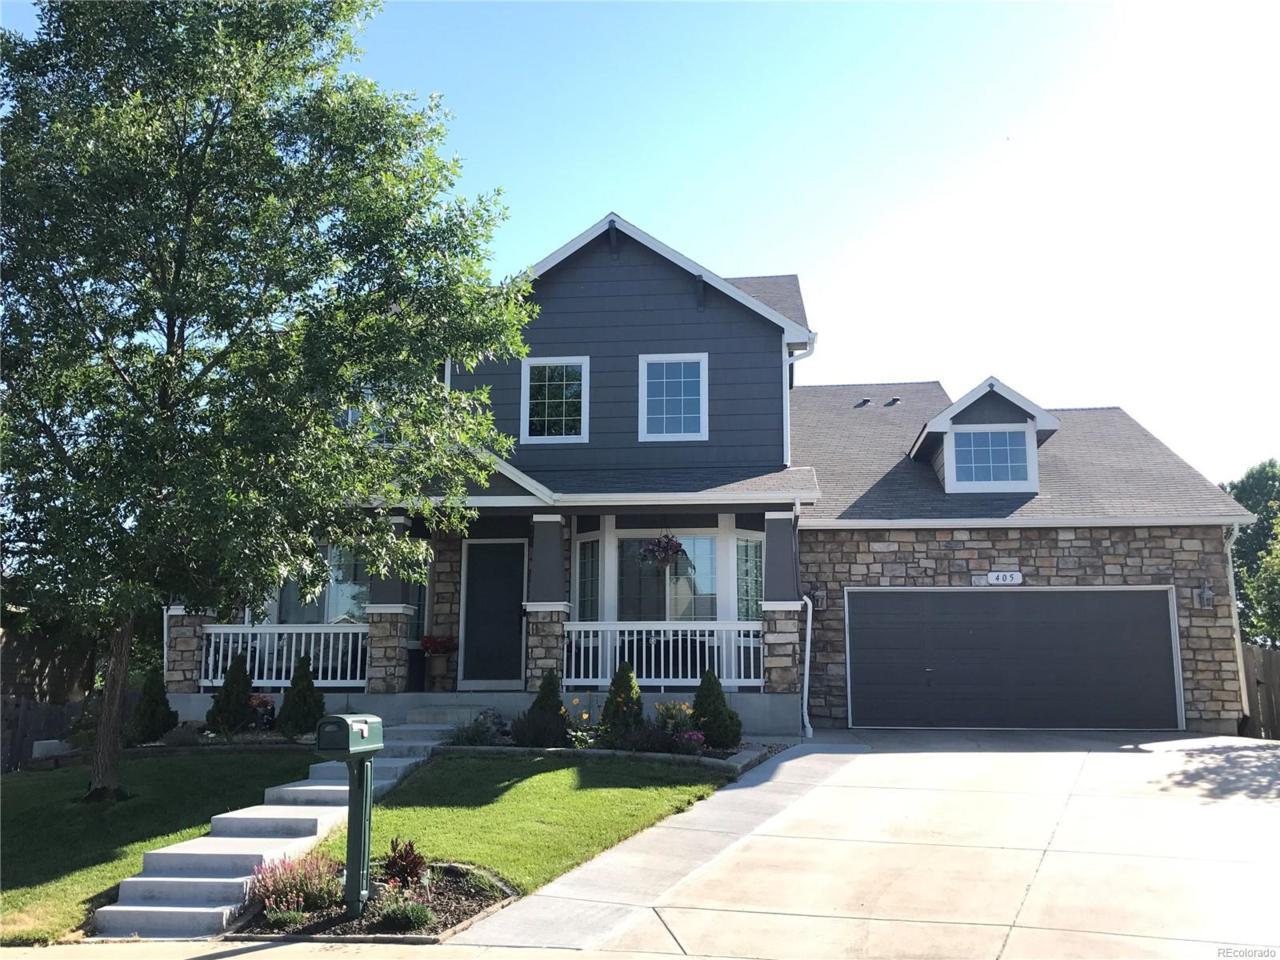 405 Buena Vista Court, Brighton, CO 80601 (MLS #8669541) :: 8z Real Estate